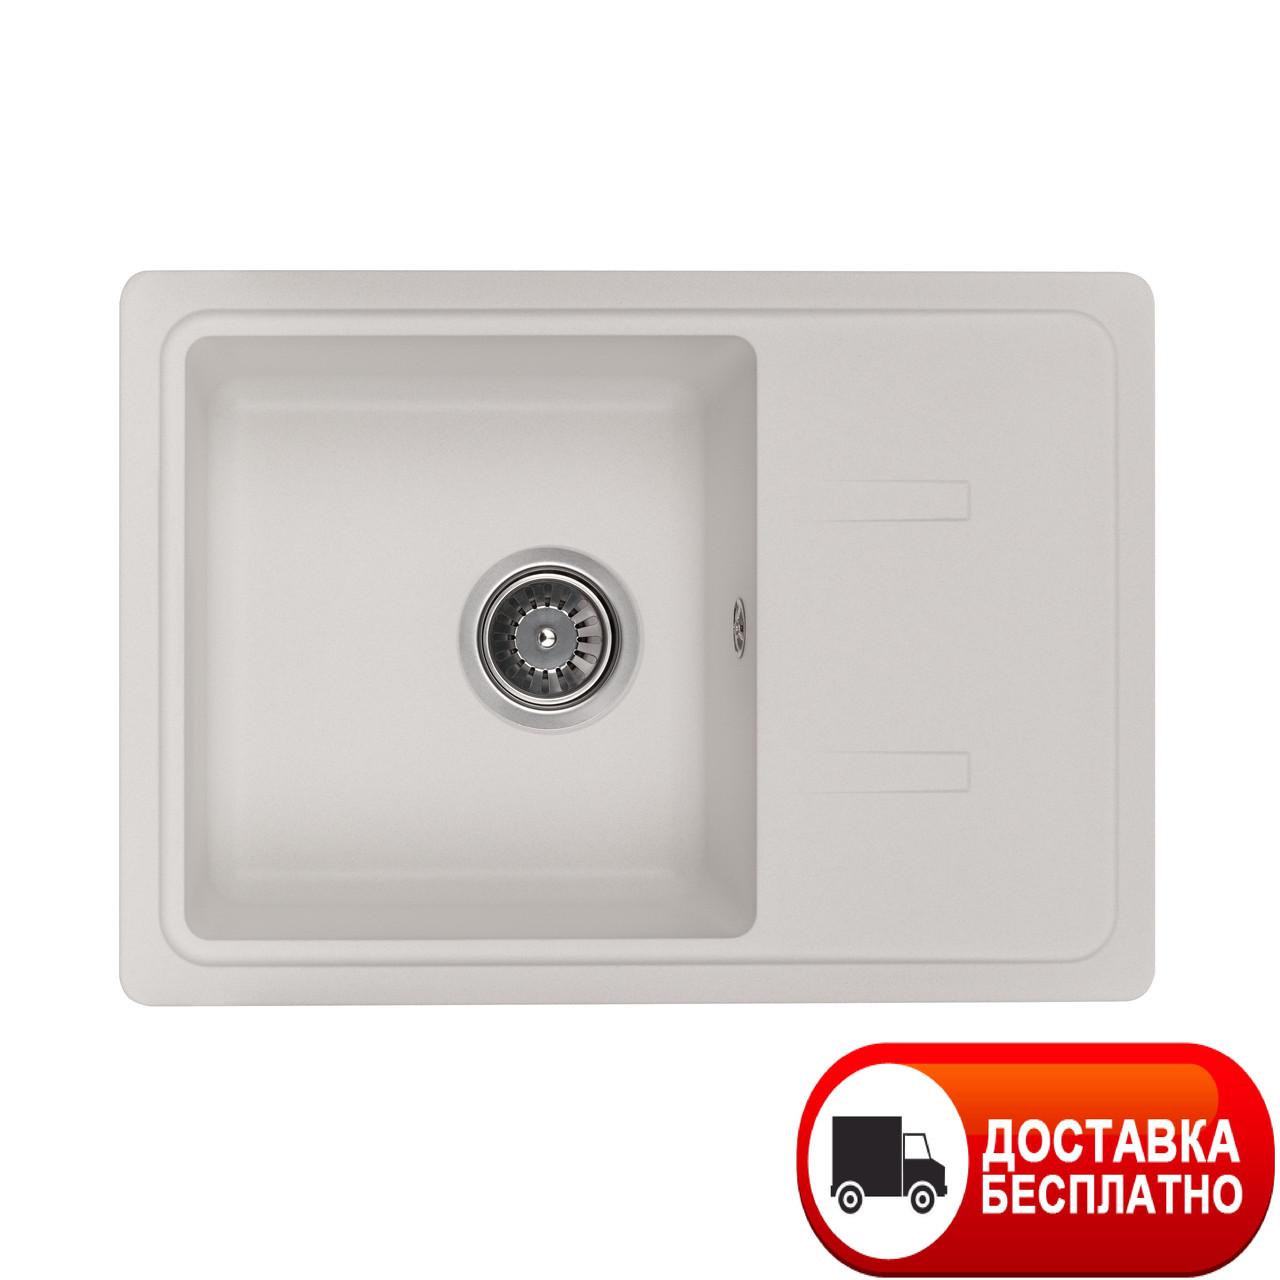 Кухонная гранитная мойка Granado PALMA white 62*44